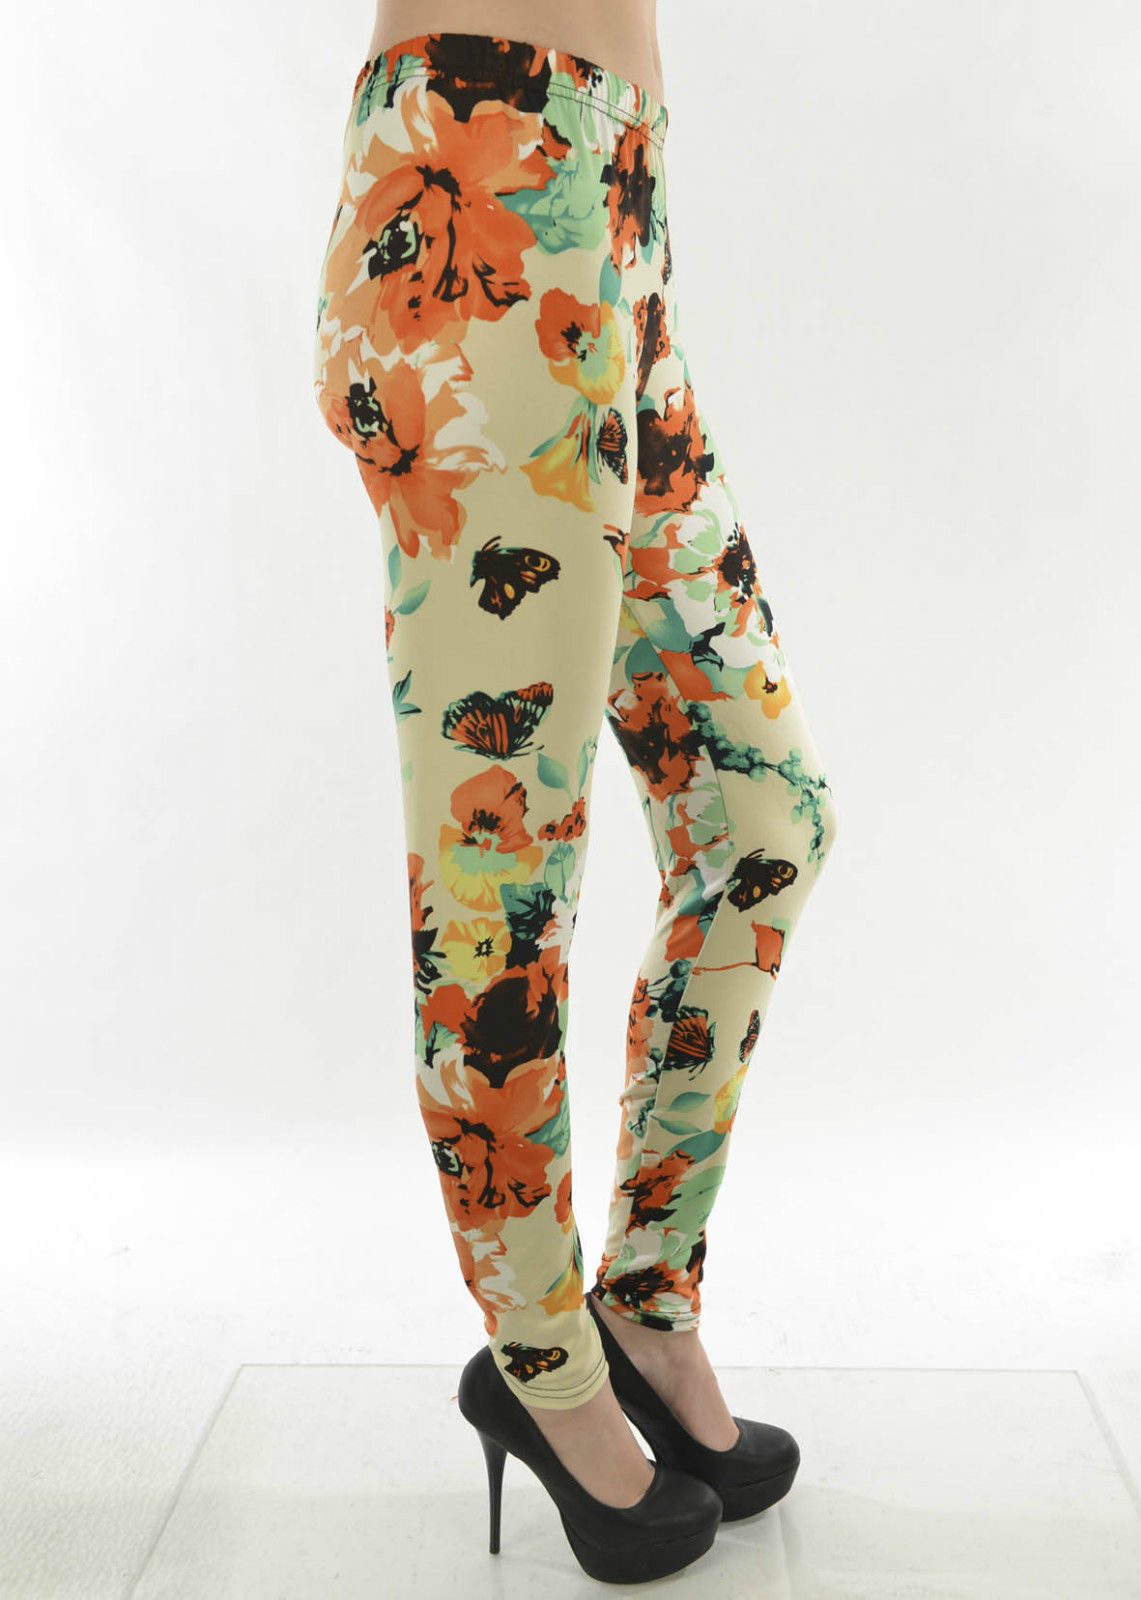 Lady's The Monarch Fashion Legging image 2